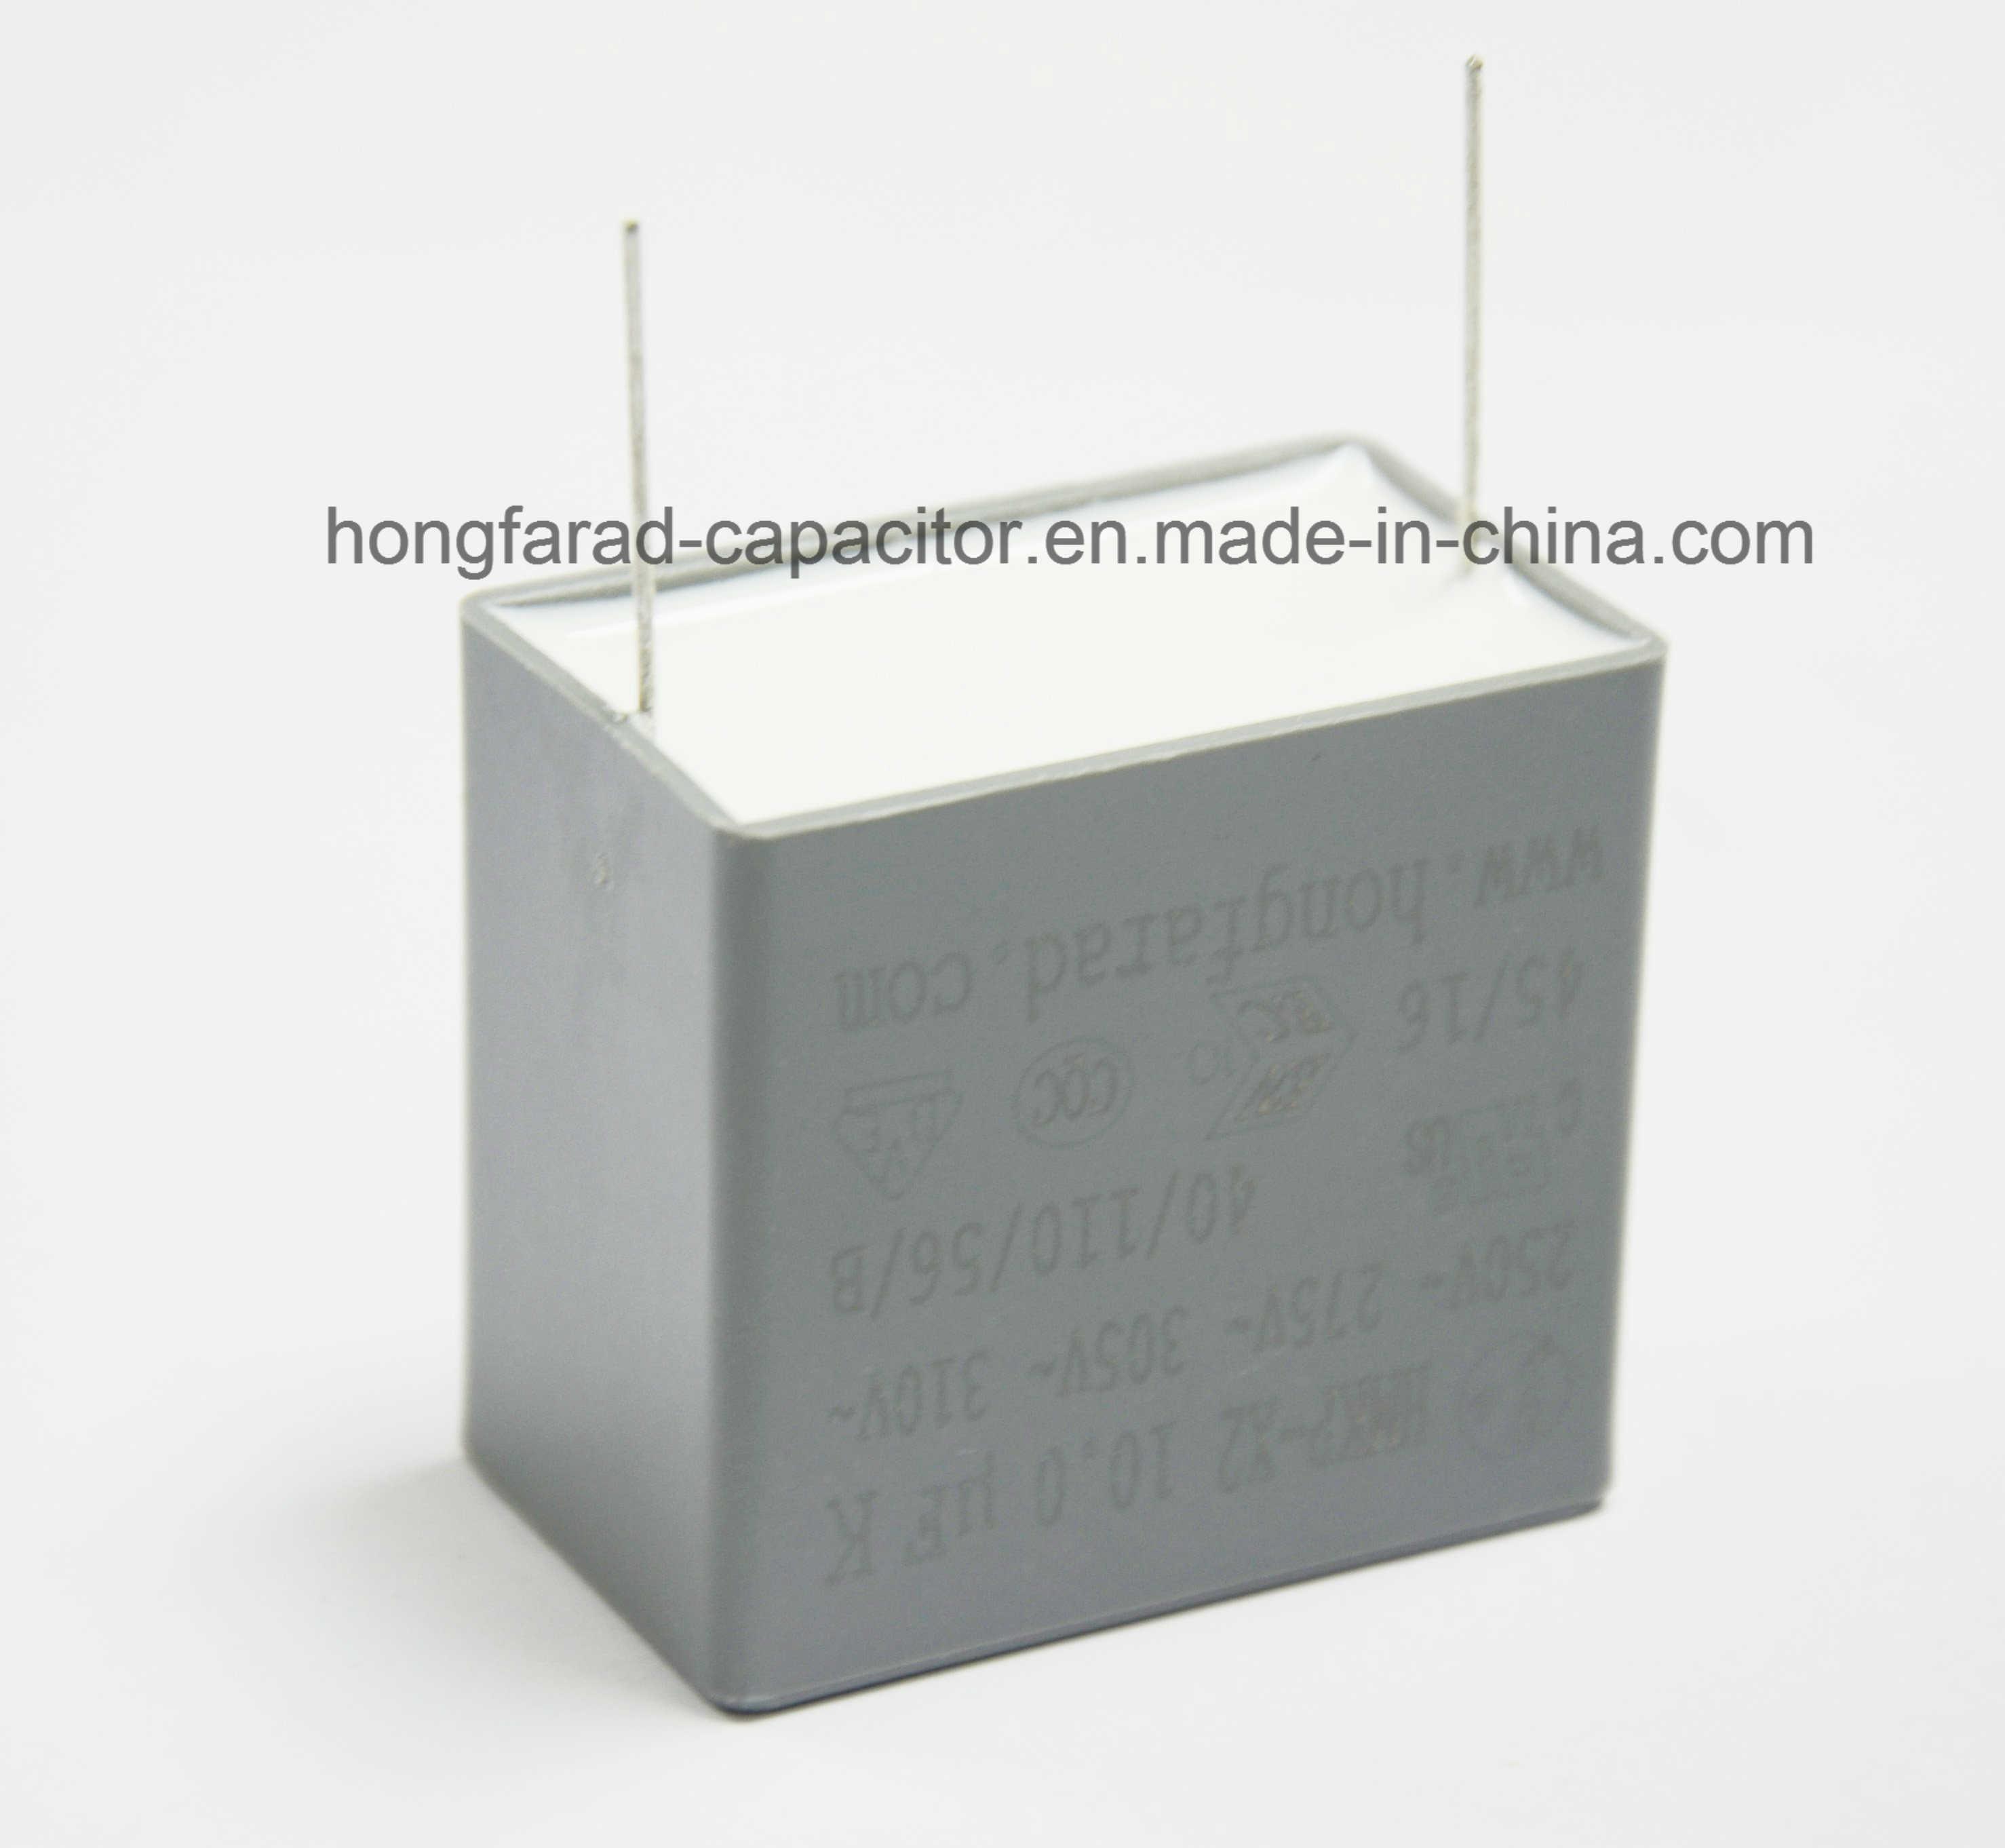 Metallized Polypropylene Film AC Capacitor Cbb62b Mkb